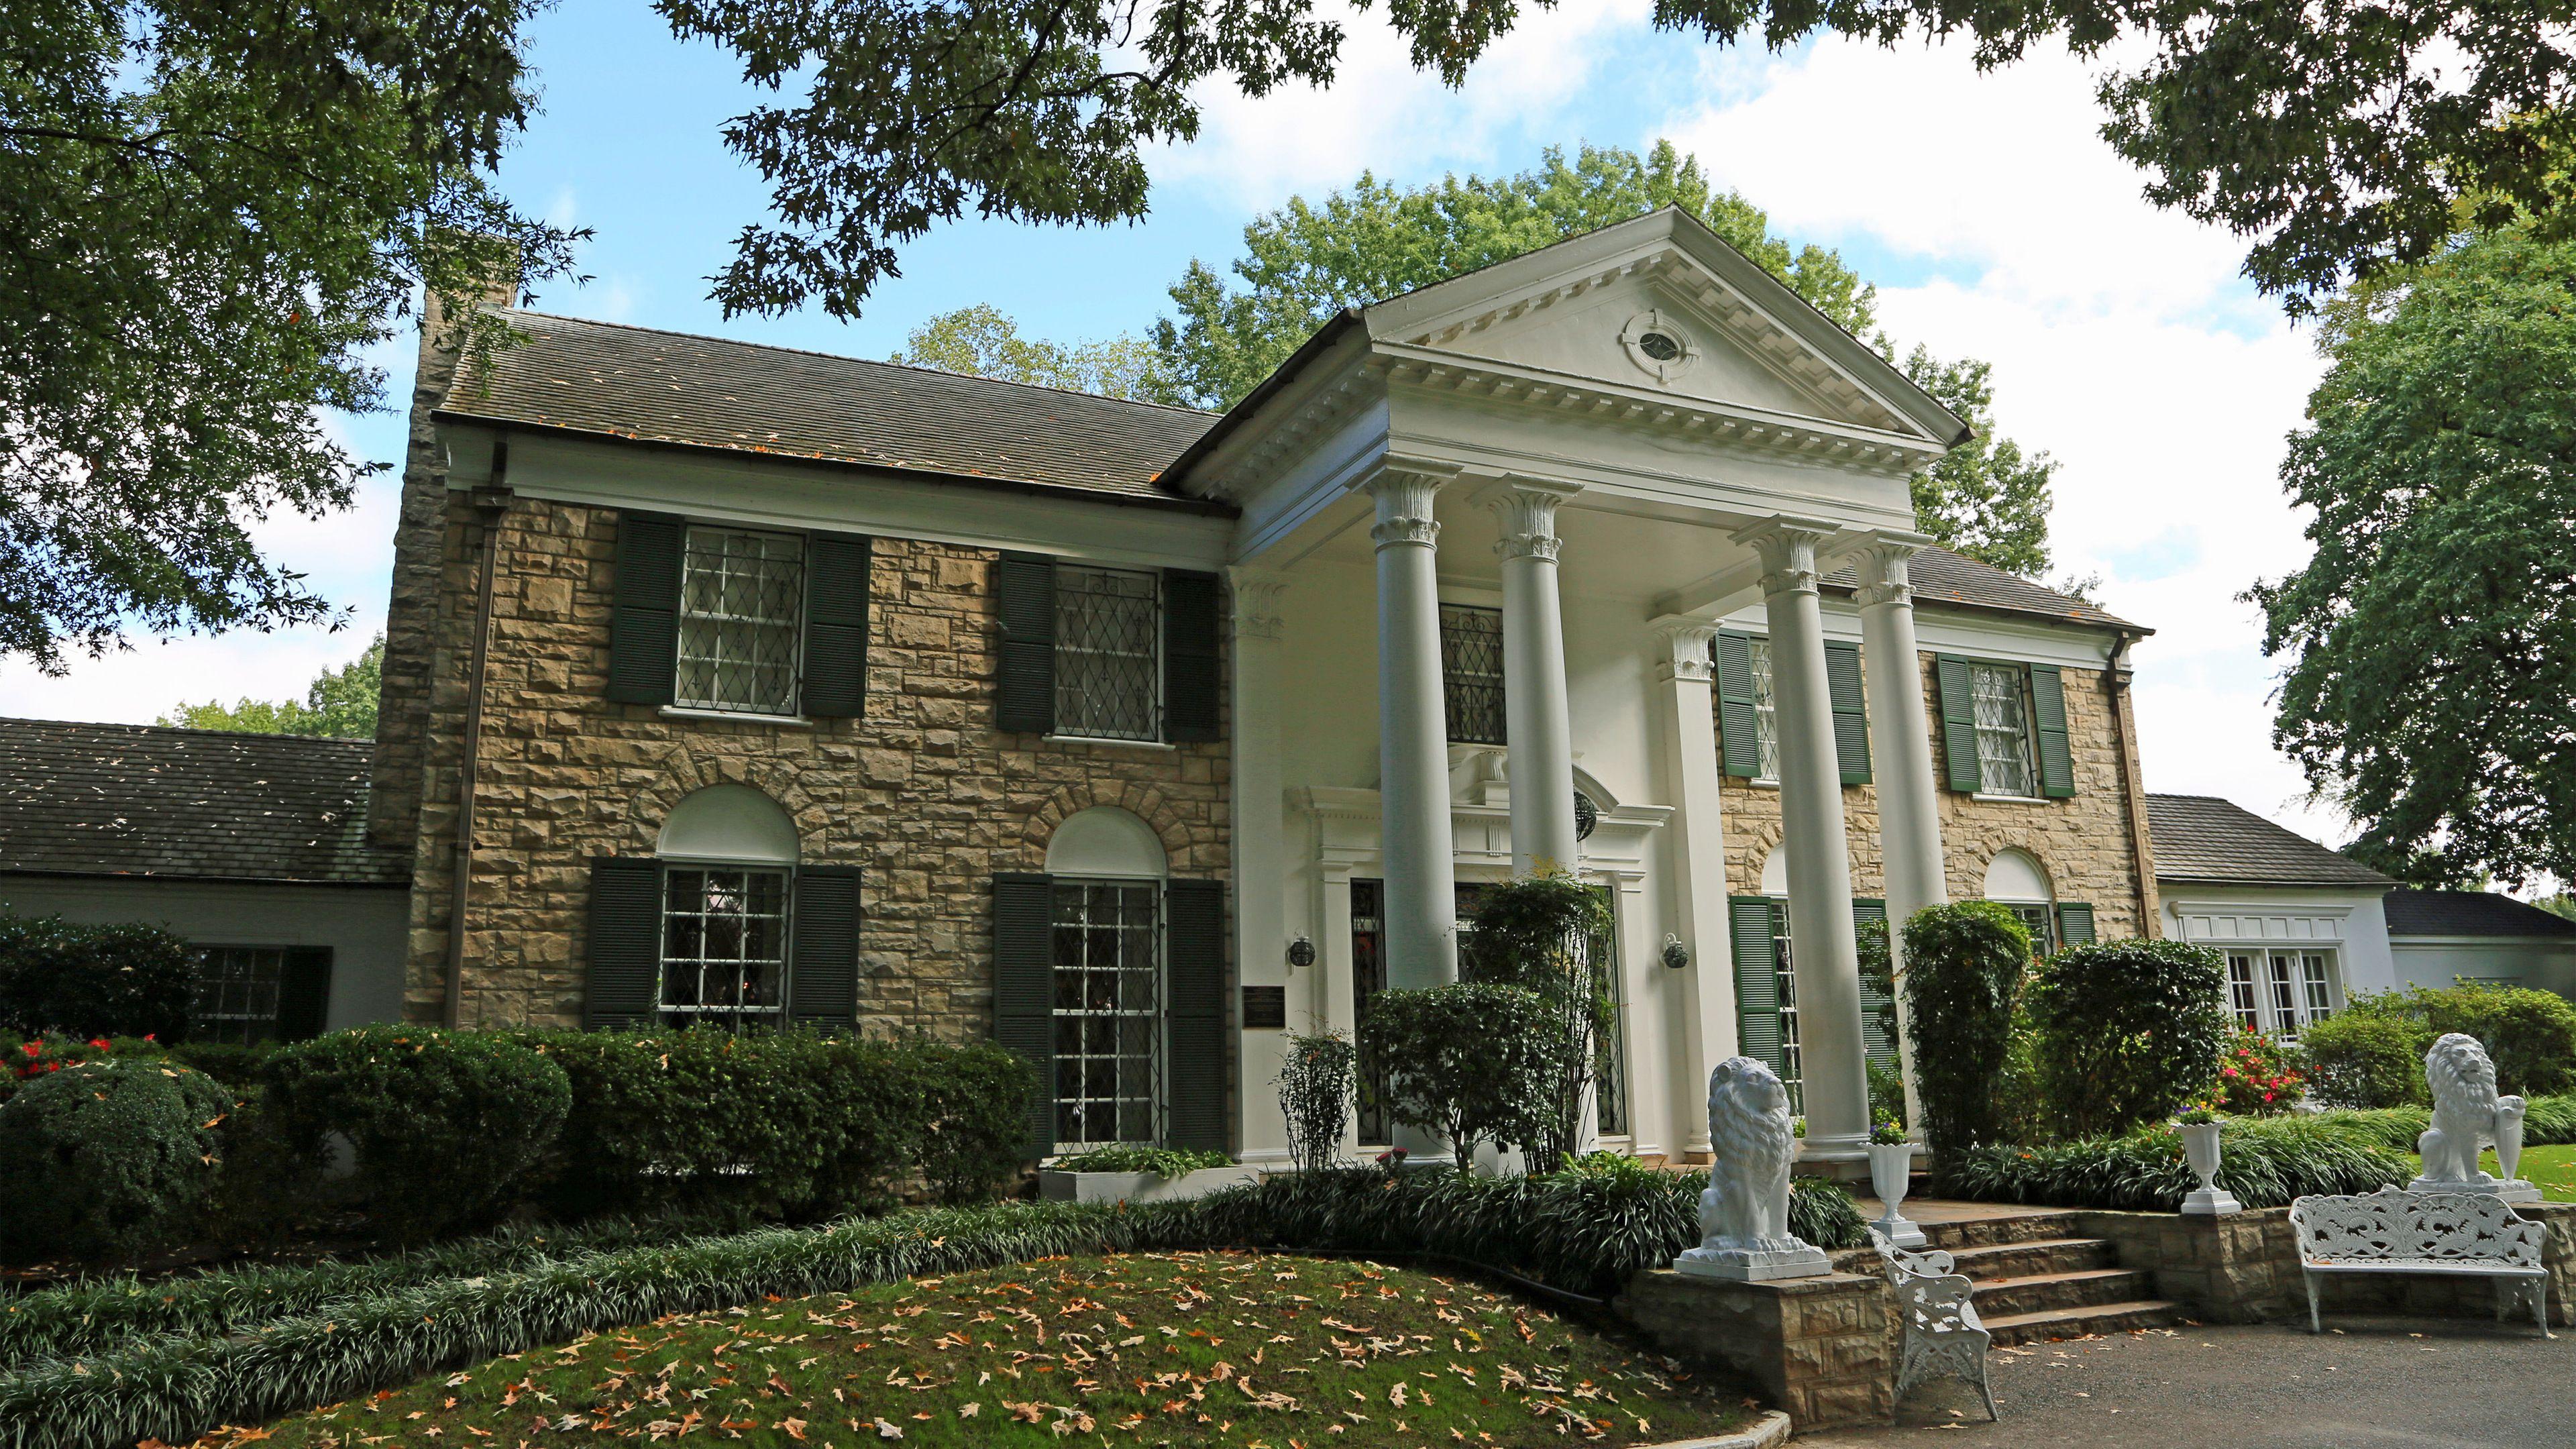 Exterior of Graceland in Memphis